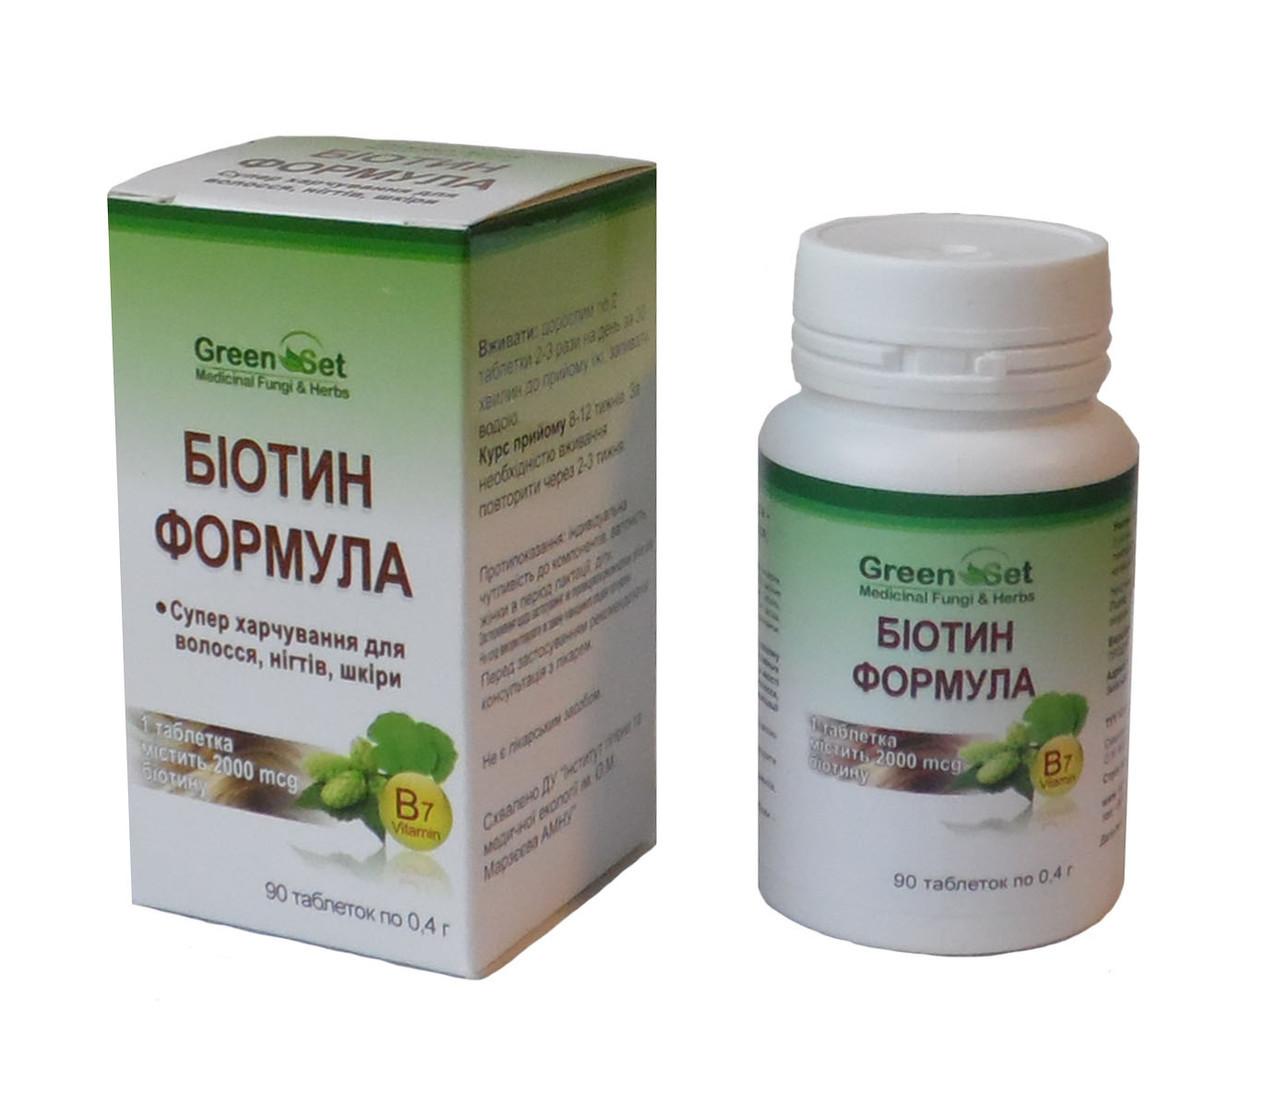 БАД Биотин формула с коллагеном  супер питание для волос ногтей кожи 90 таблеток ДаникаФарм